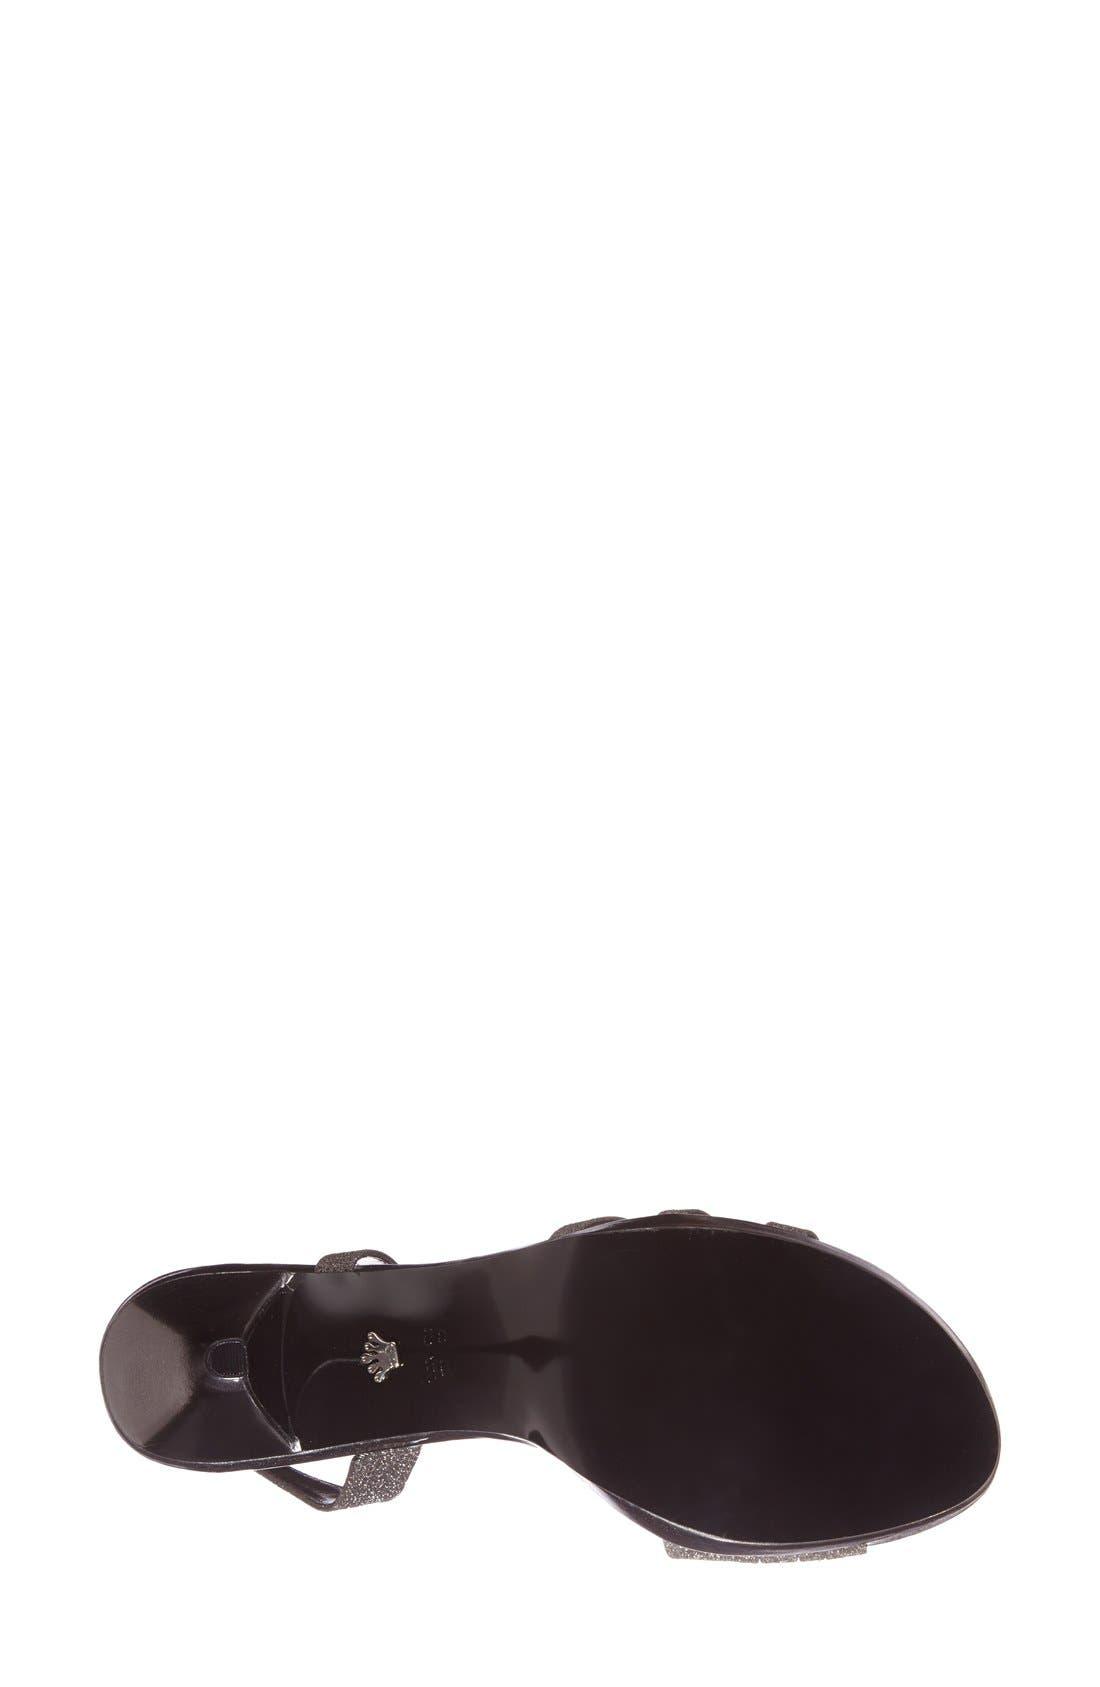 'Neely' Slingback Platform Sandal,                             Alternate thumbnail 2, color,                             CHARCOAL